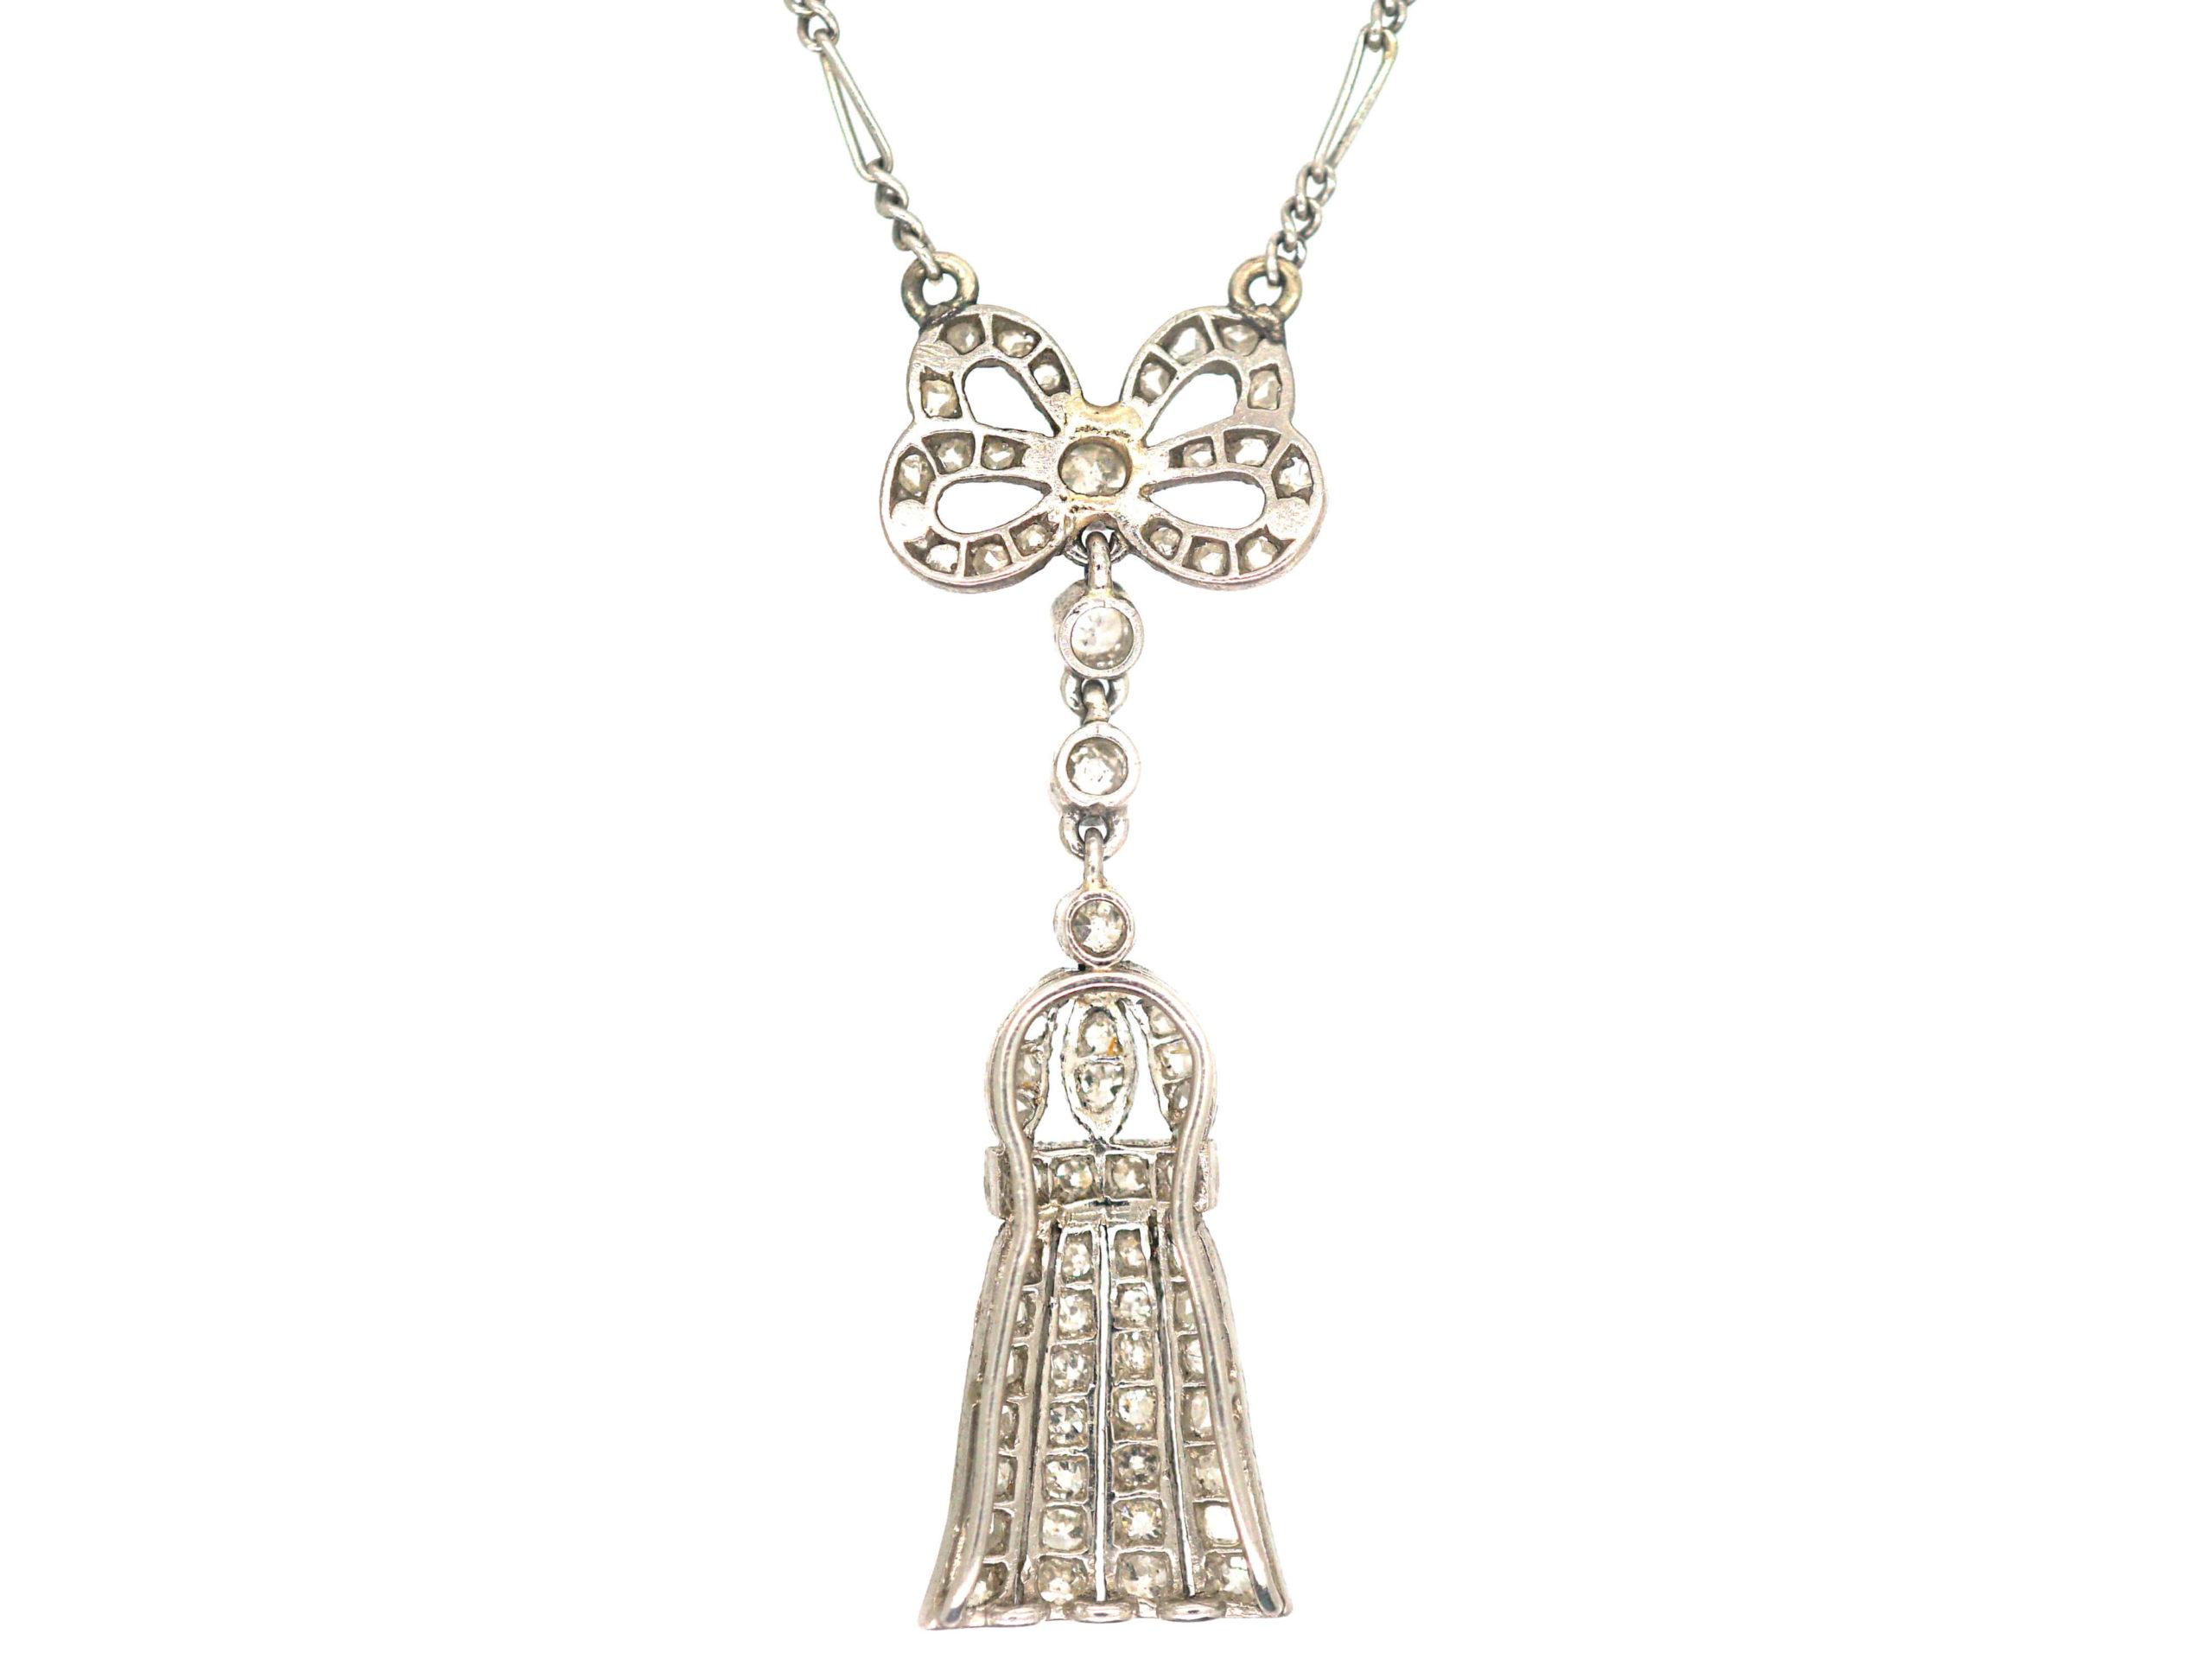 Edwardian Platinum, Diamond Bow & Tassel Pendant on Chain